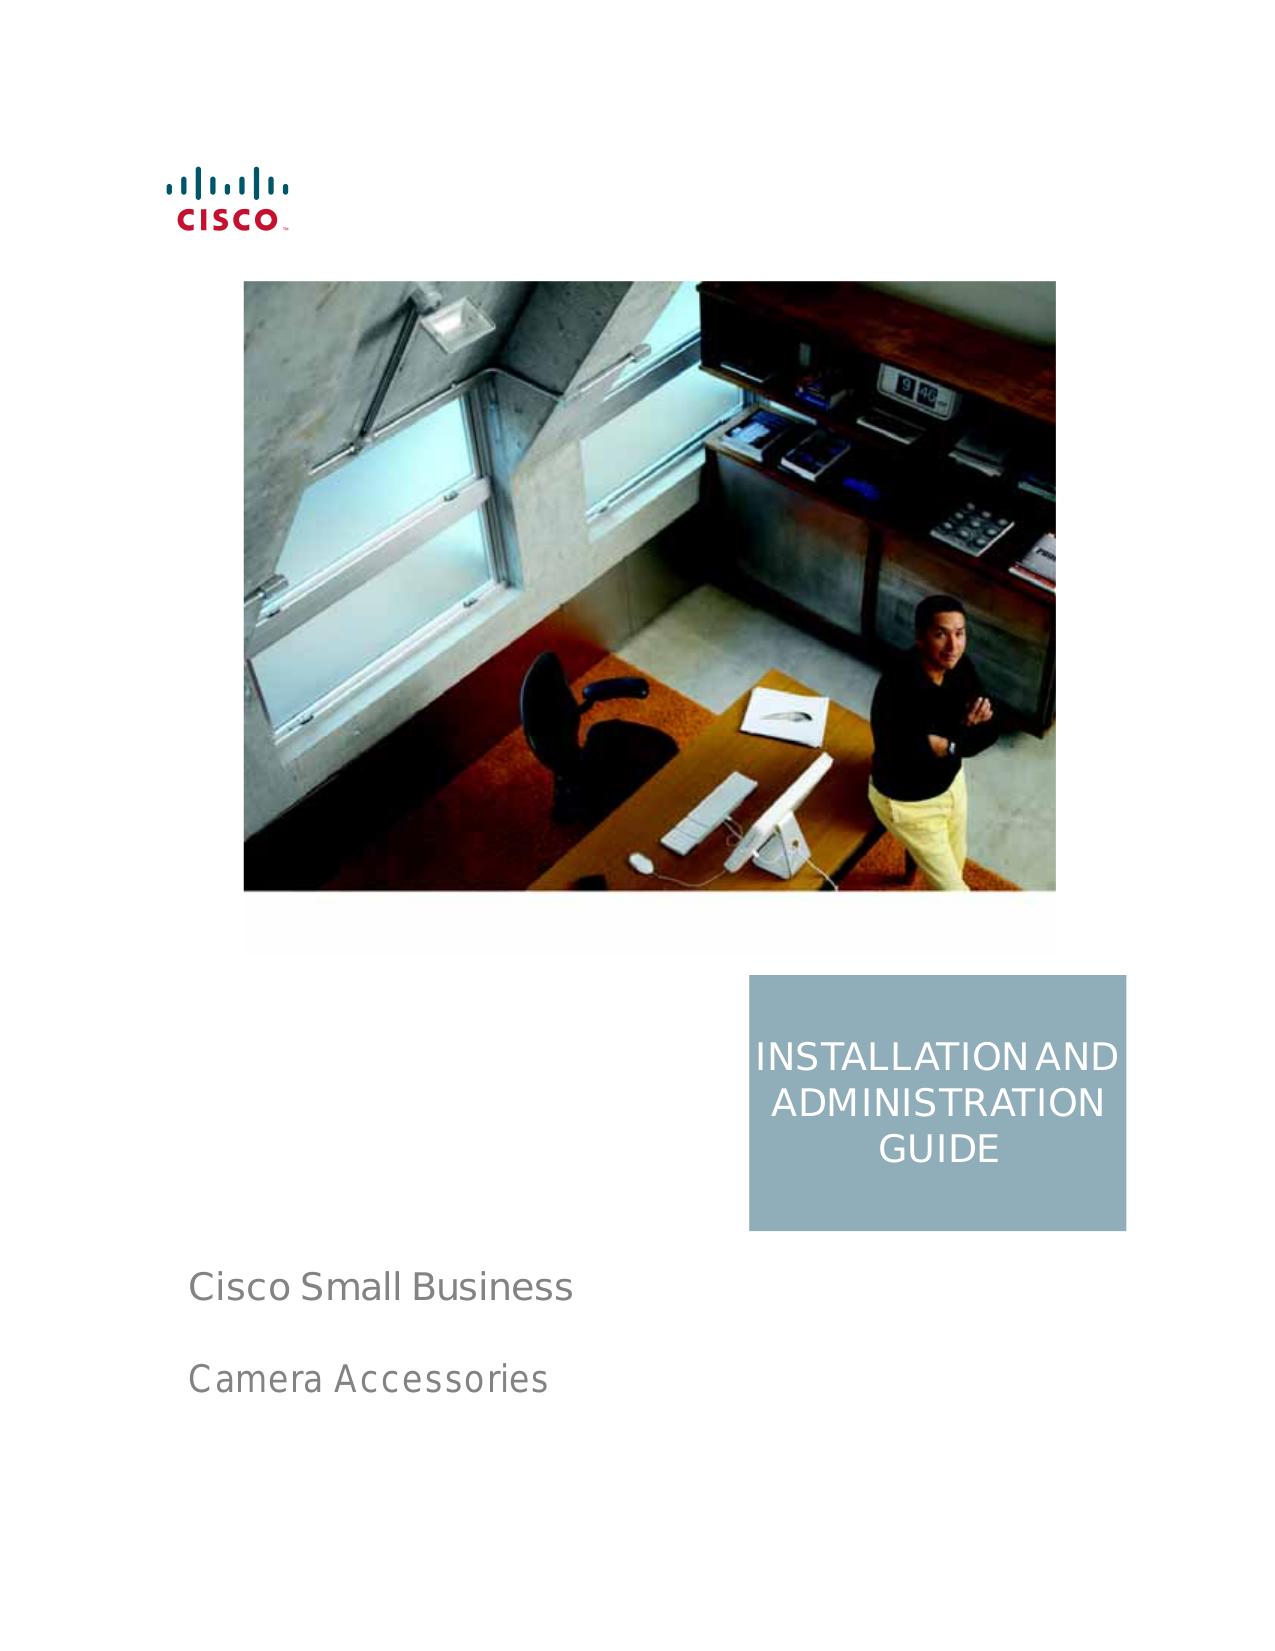 pdf for Linksys Security Camera PVC2300 manual